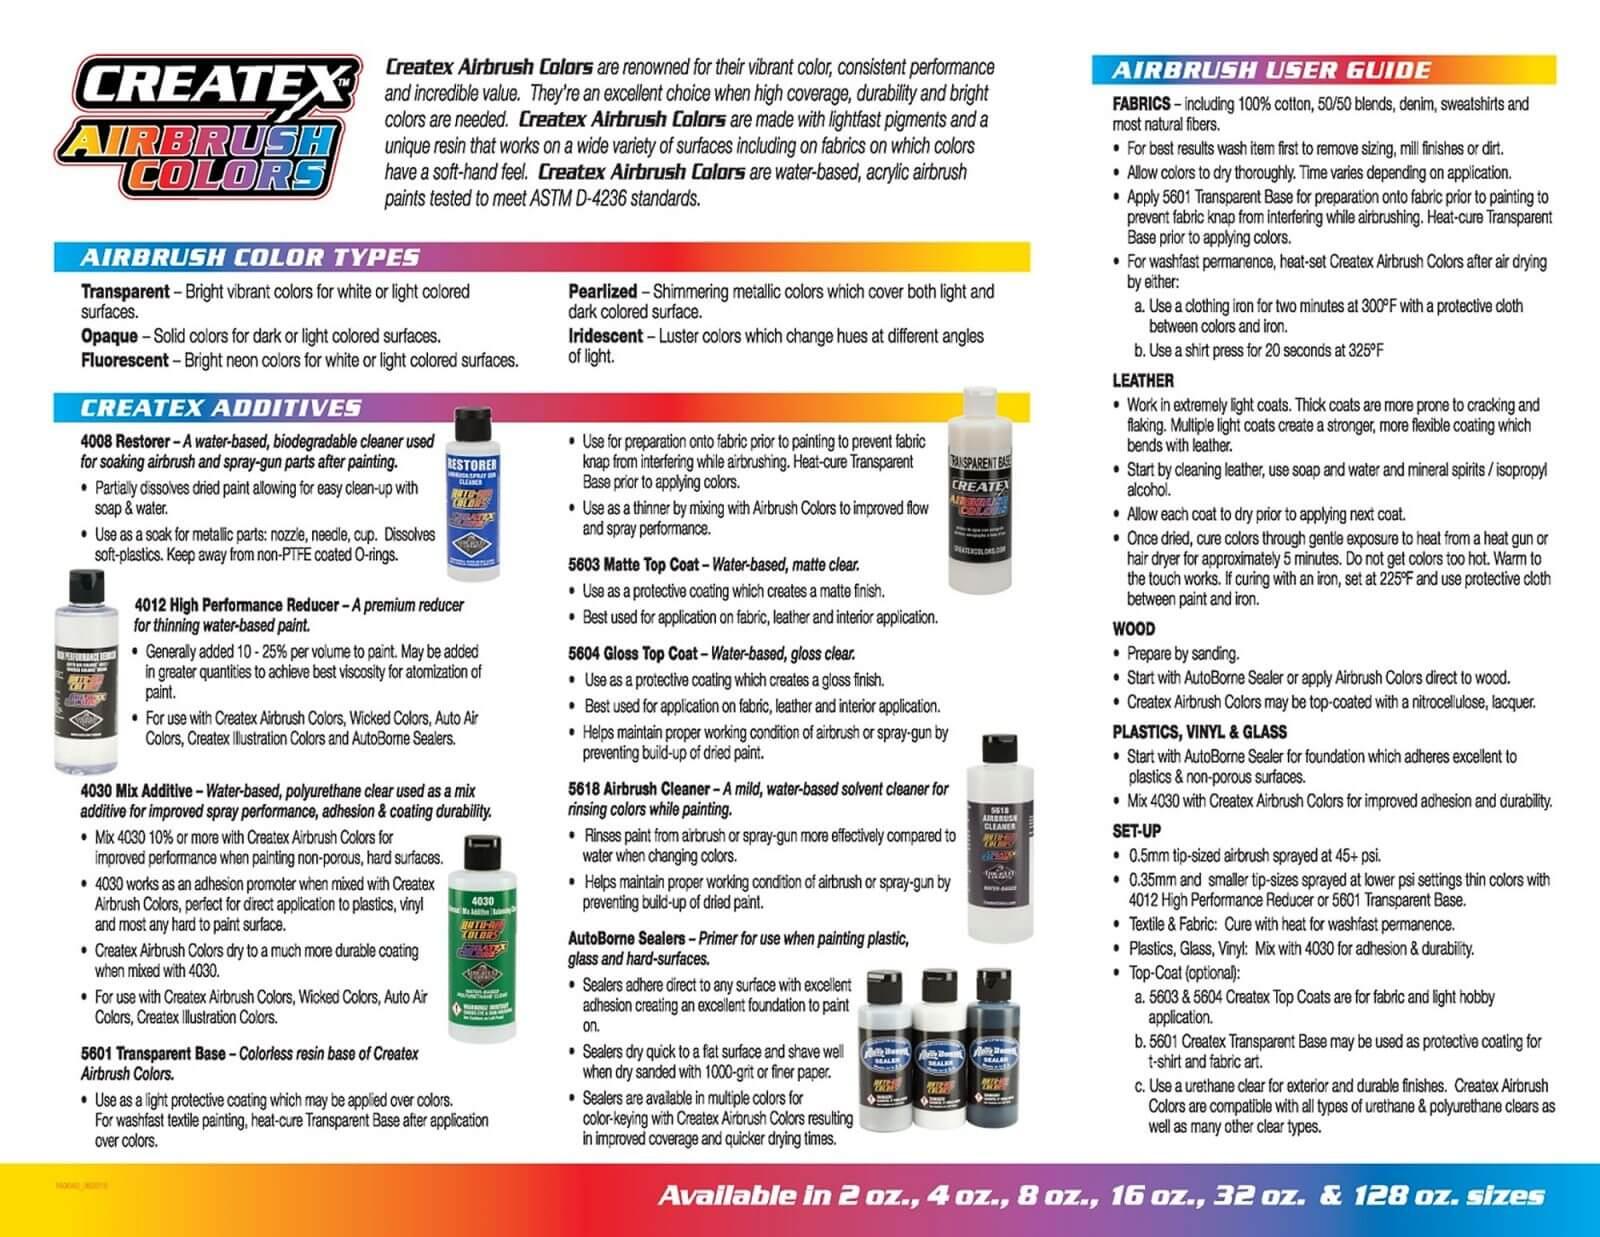 how to use createx airbrush paint